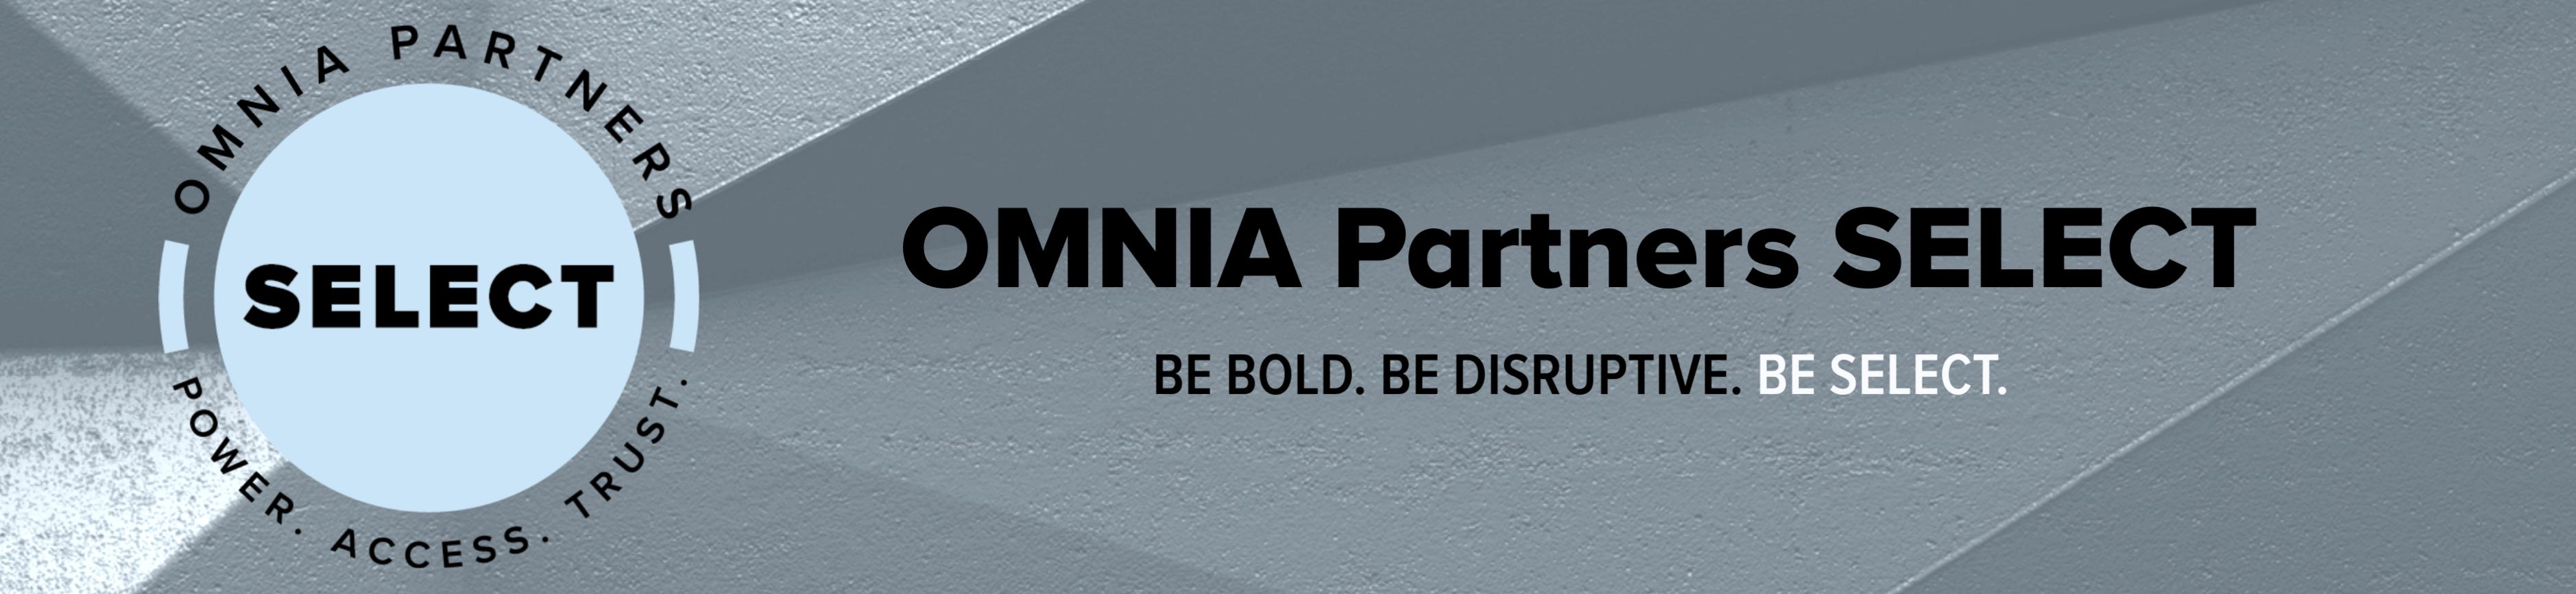 OMNIA Partners SELECT